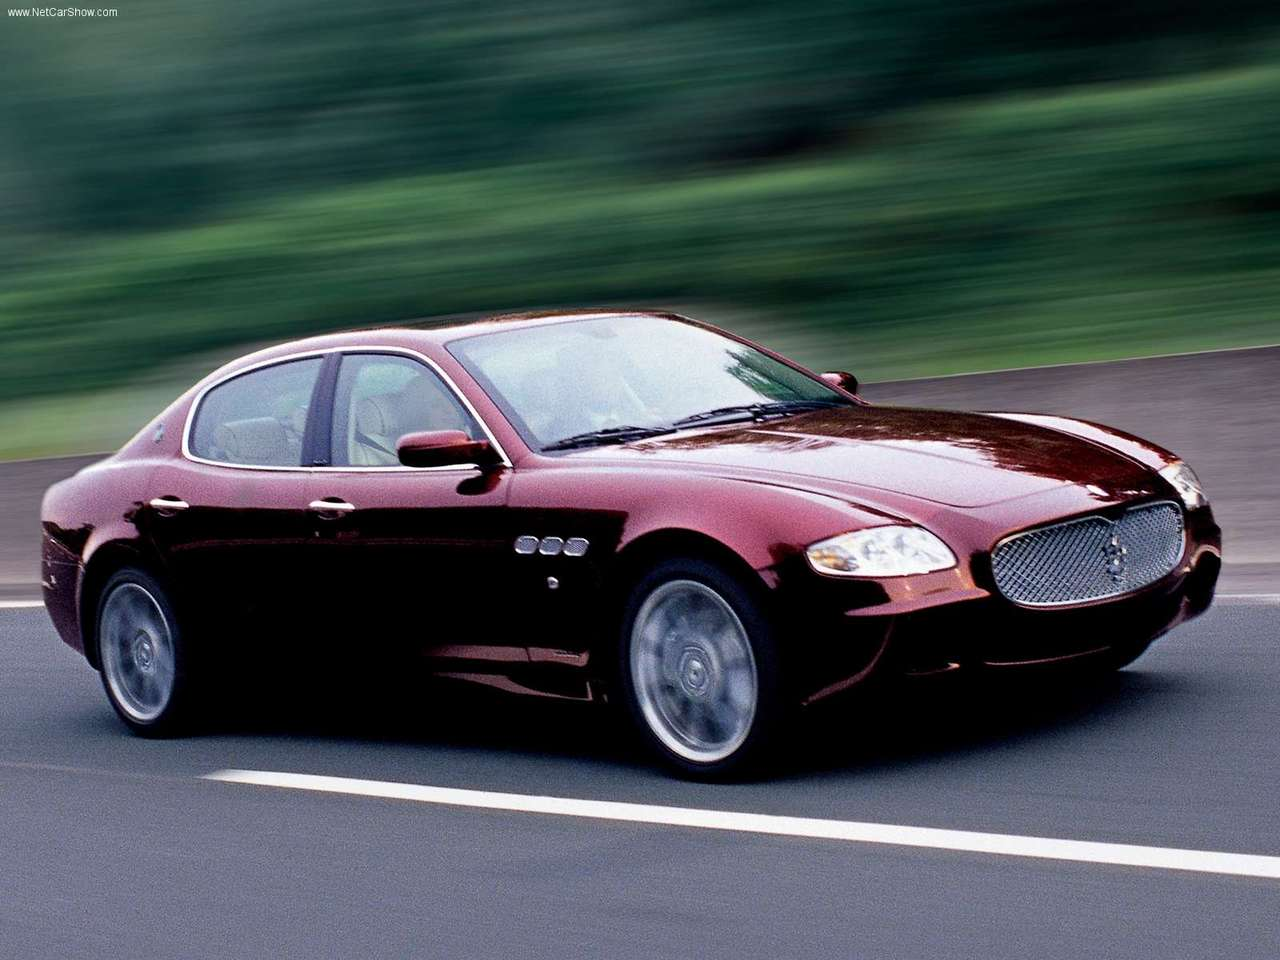 http://3.bp.blogspot.com/_H1gBps8JpiY/Sw2OTyfsyzI/AAAAAAAAId4/nWOzc3uwmzk/s1600/Maserati-Quattroporte_Executive_GT_2006_1280x960_wallpaper_01.jpg